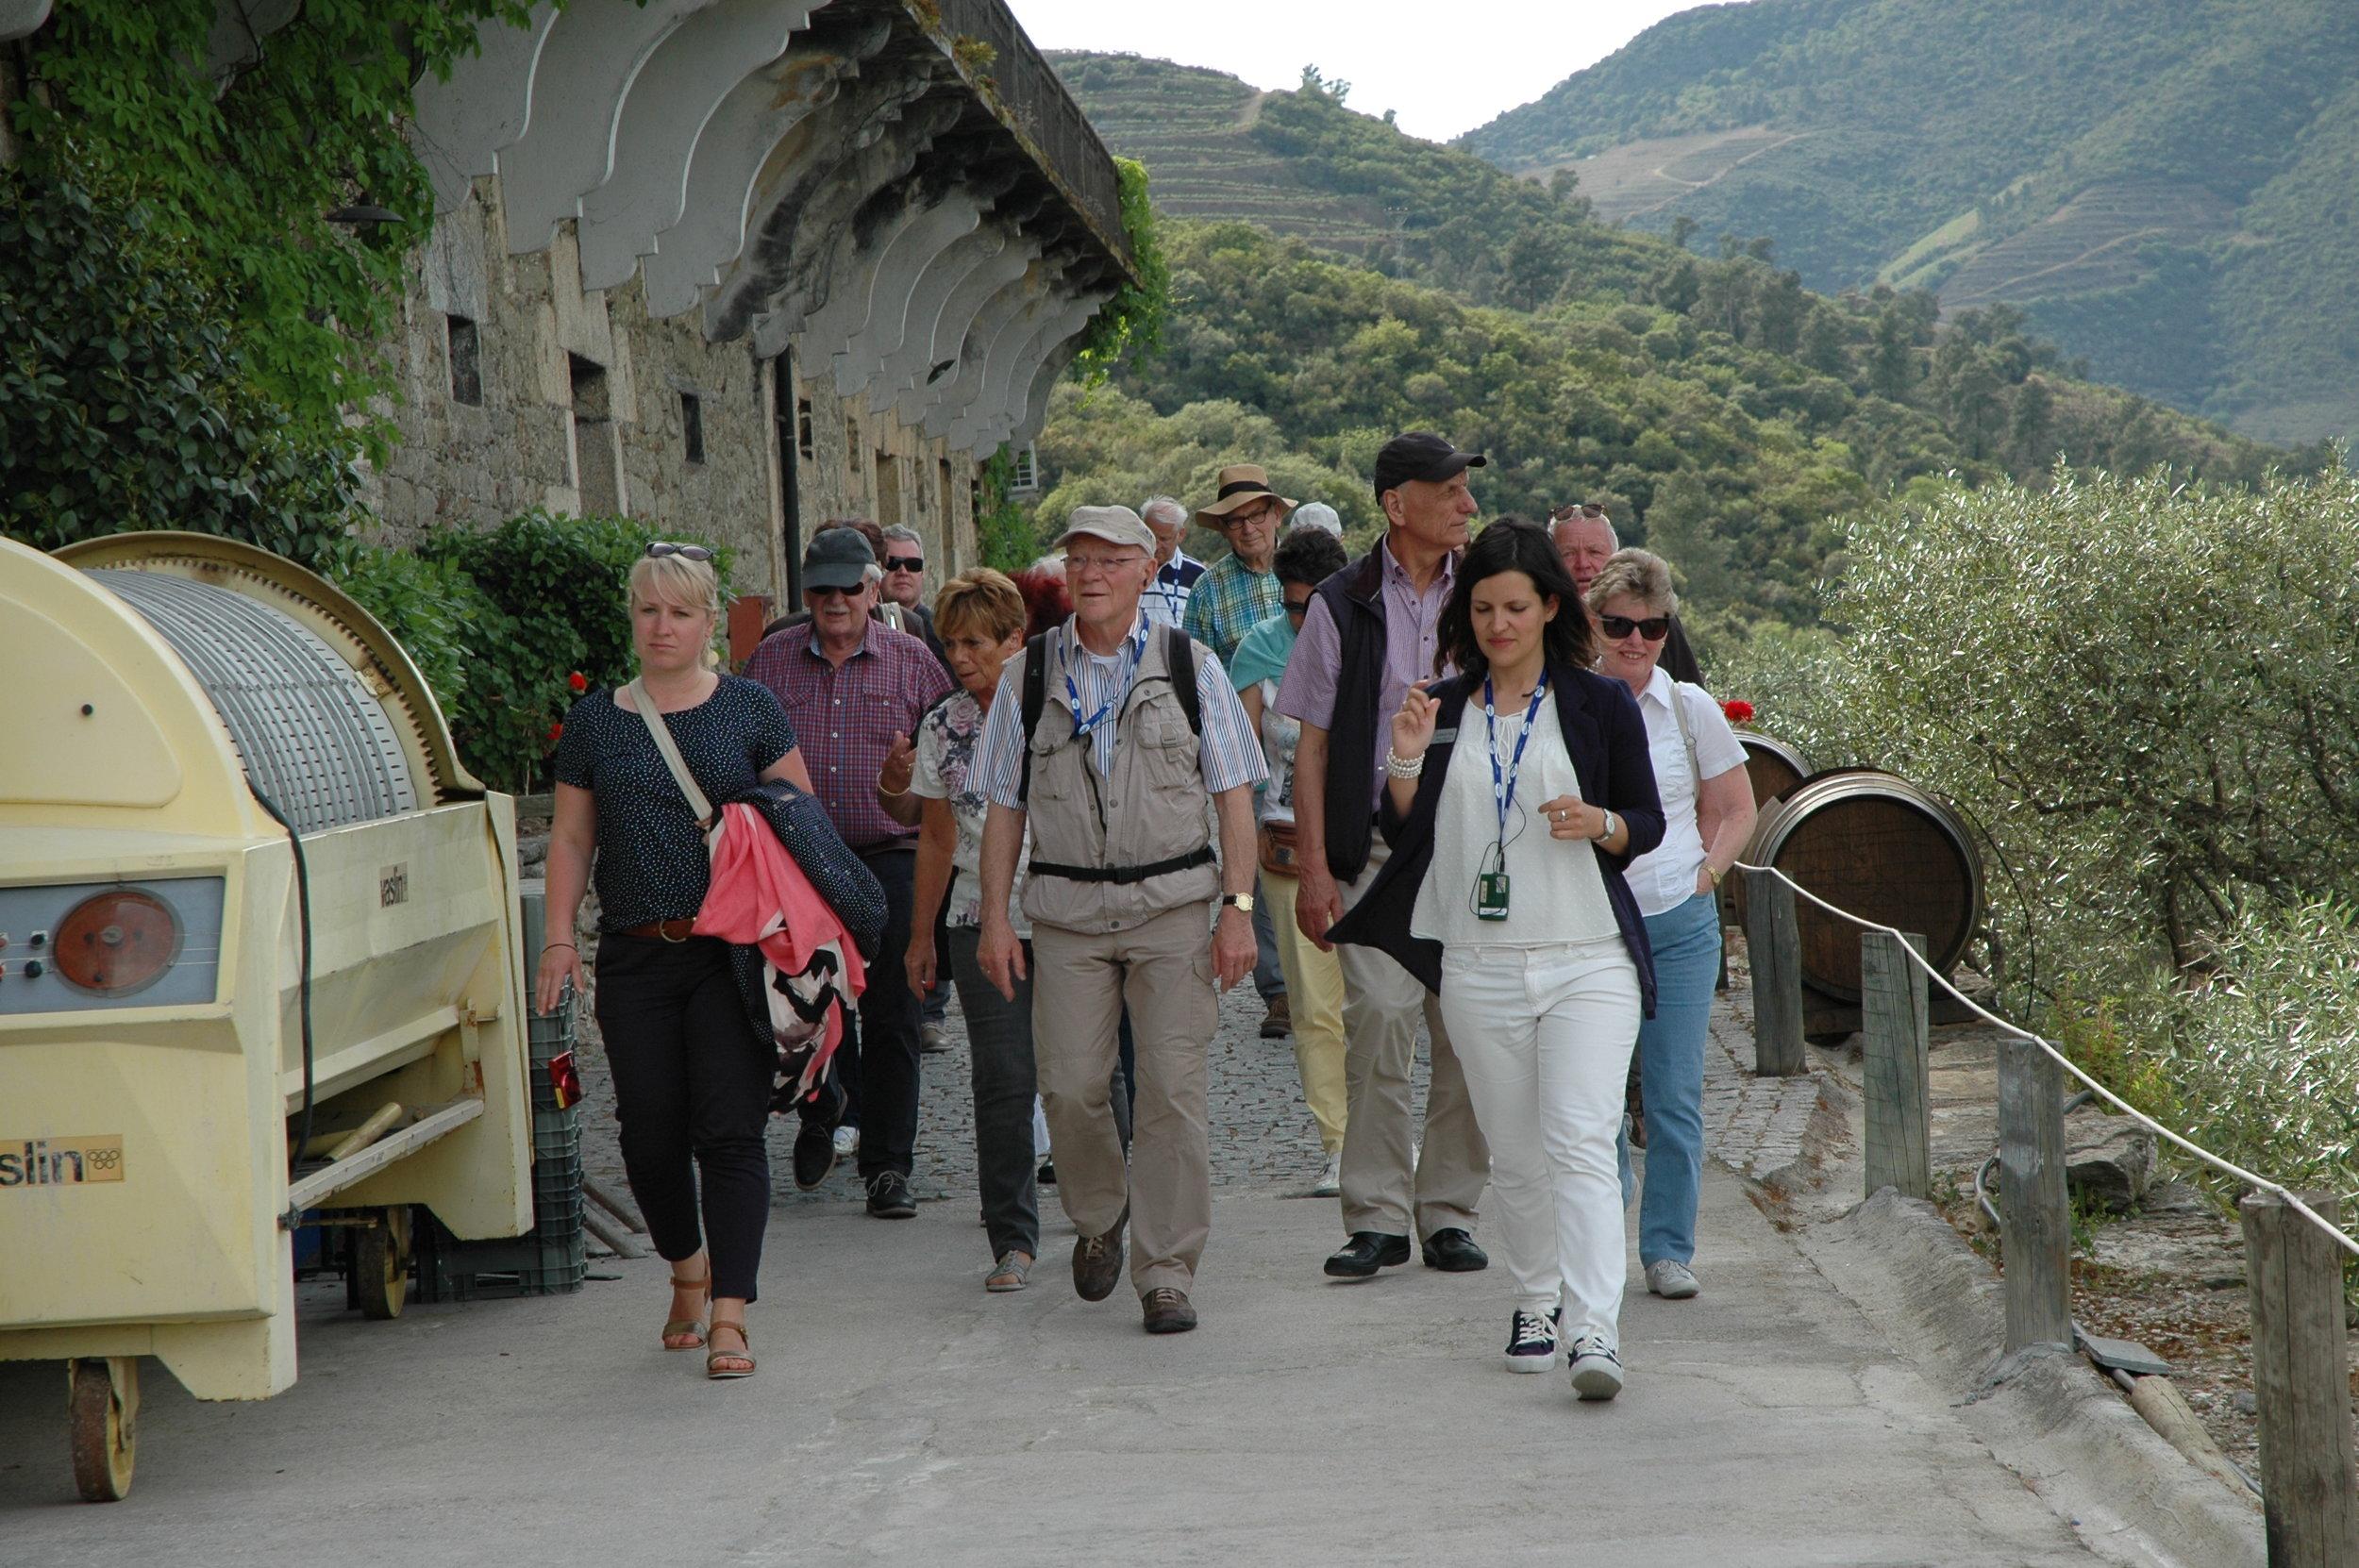 Tour guide Joana accompanies CroisiEurope tourists.